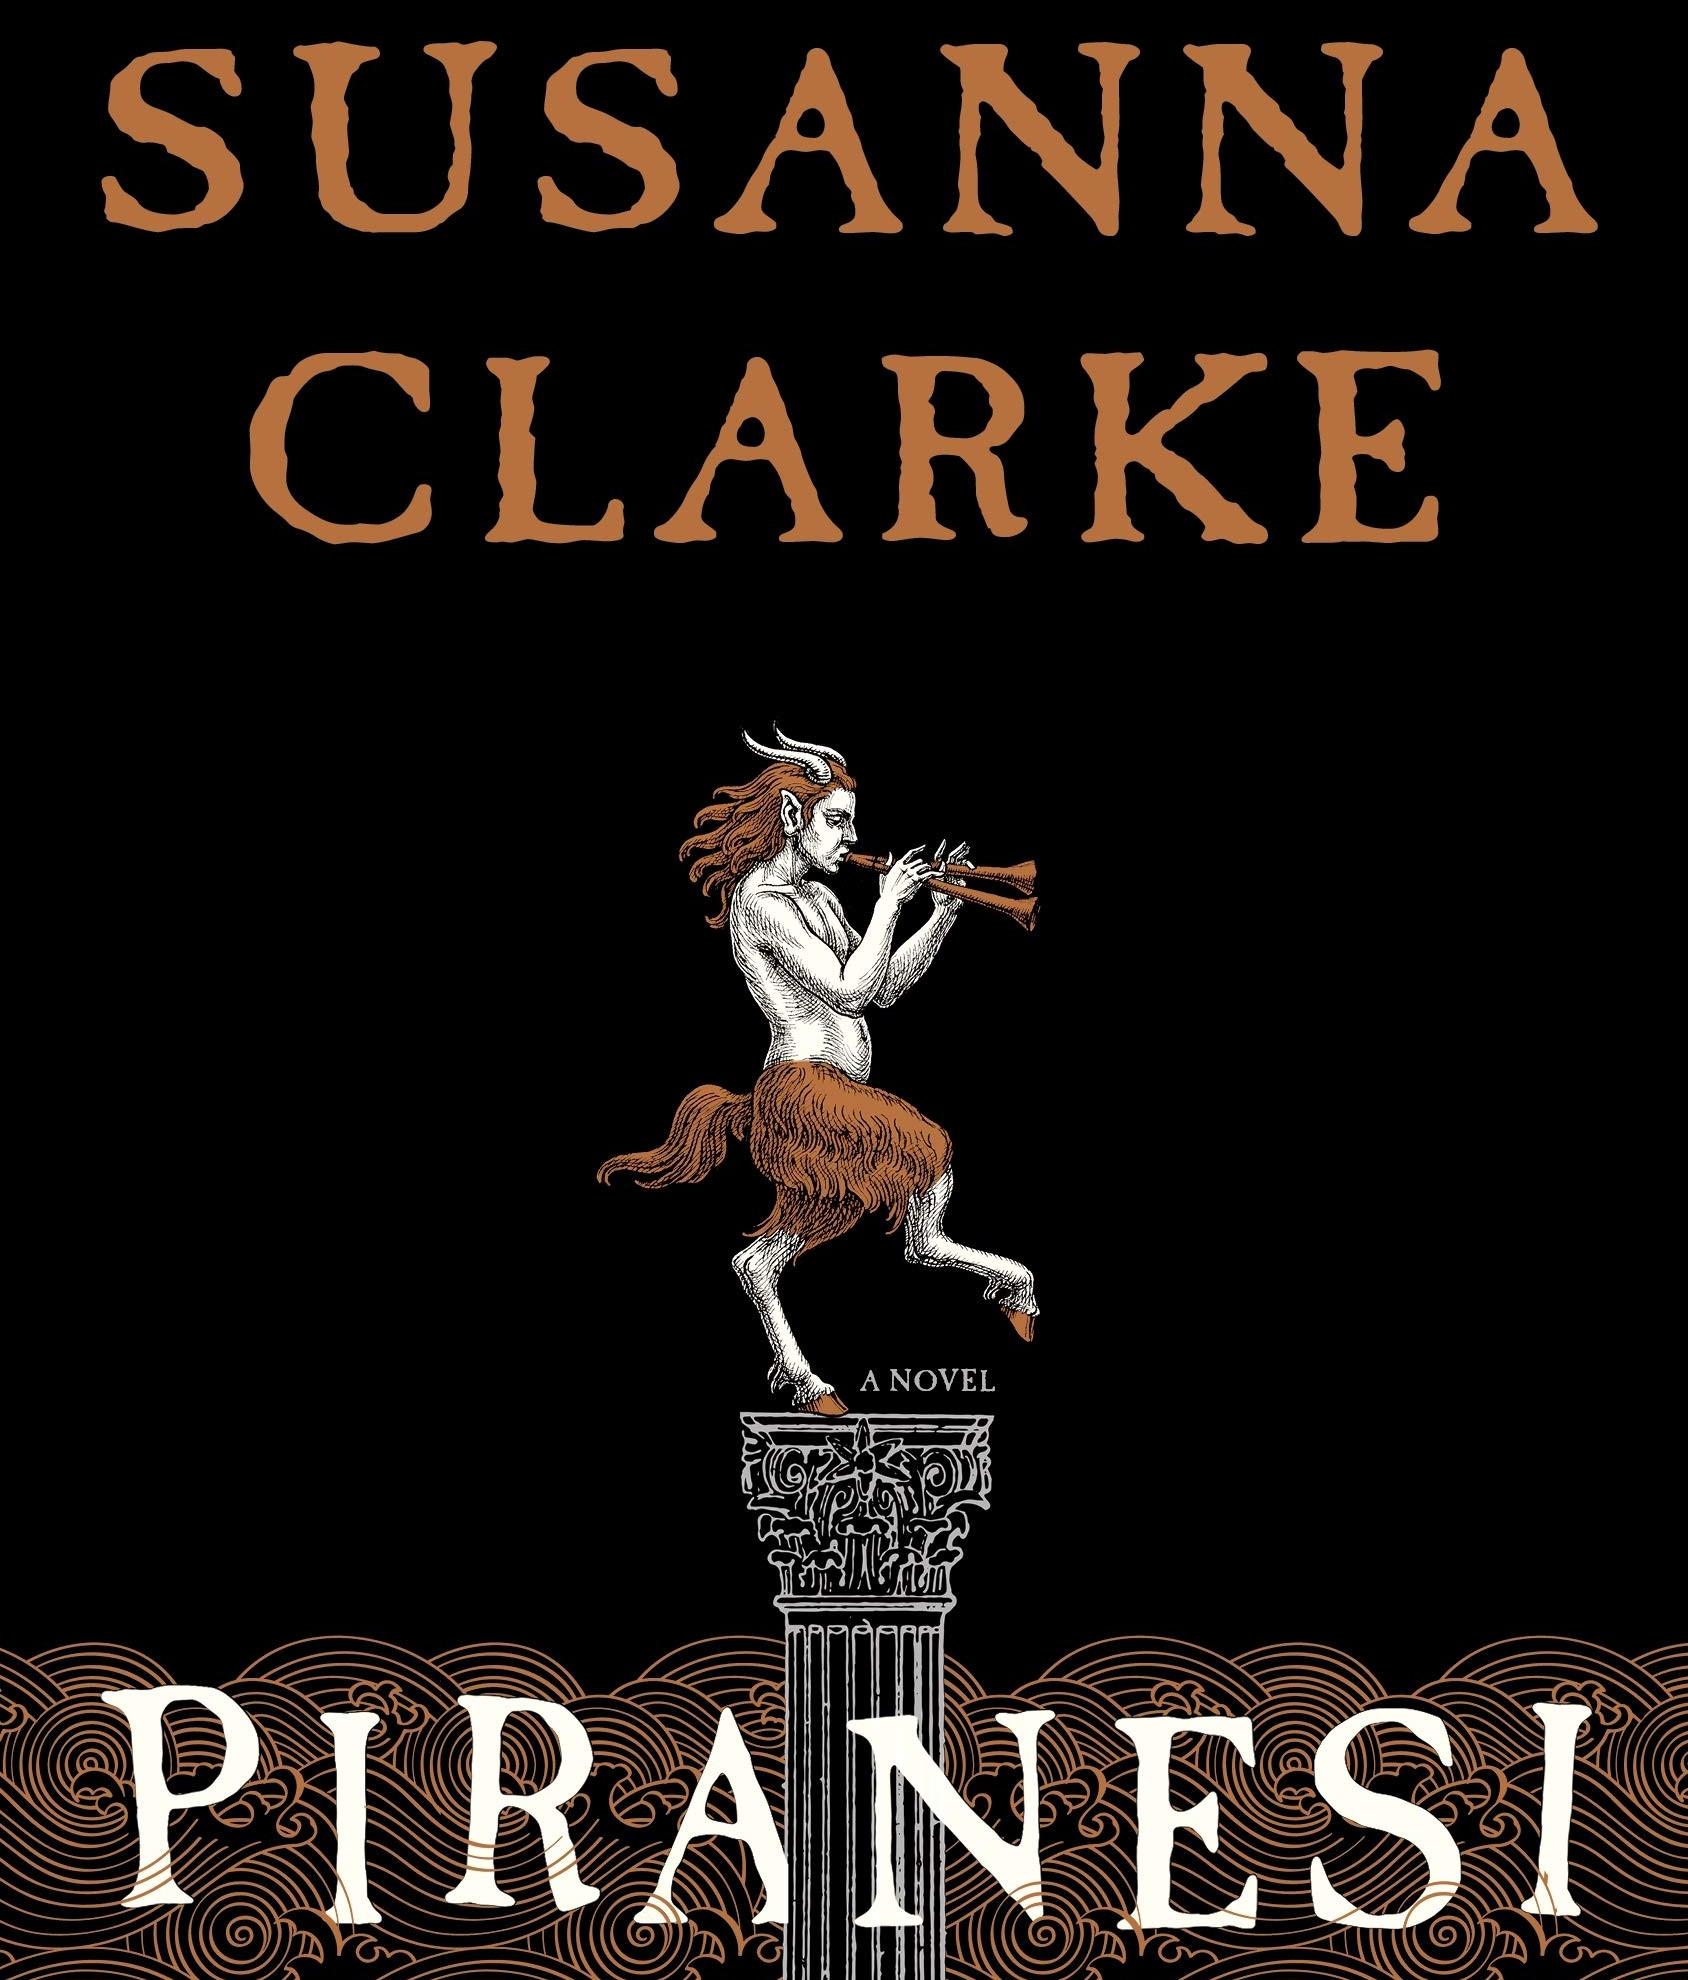 94. (November 2020) Piranesi by Susanna Clarke